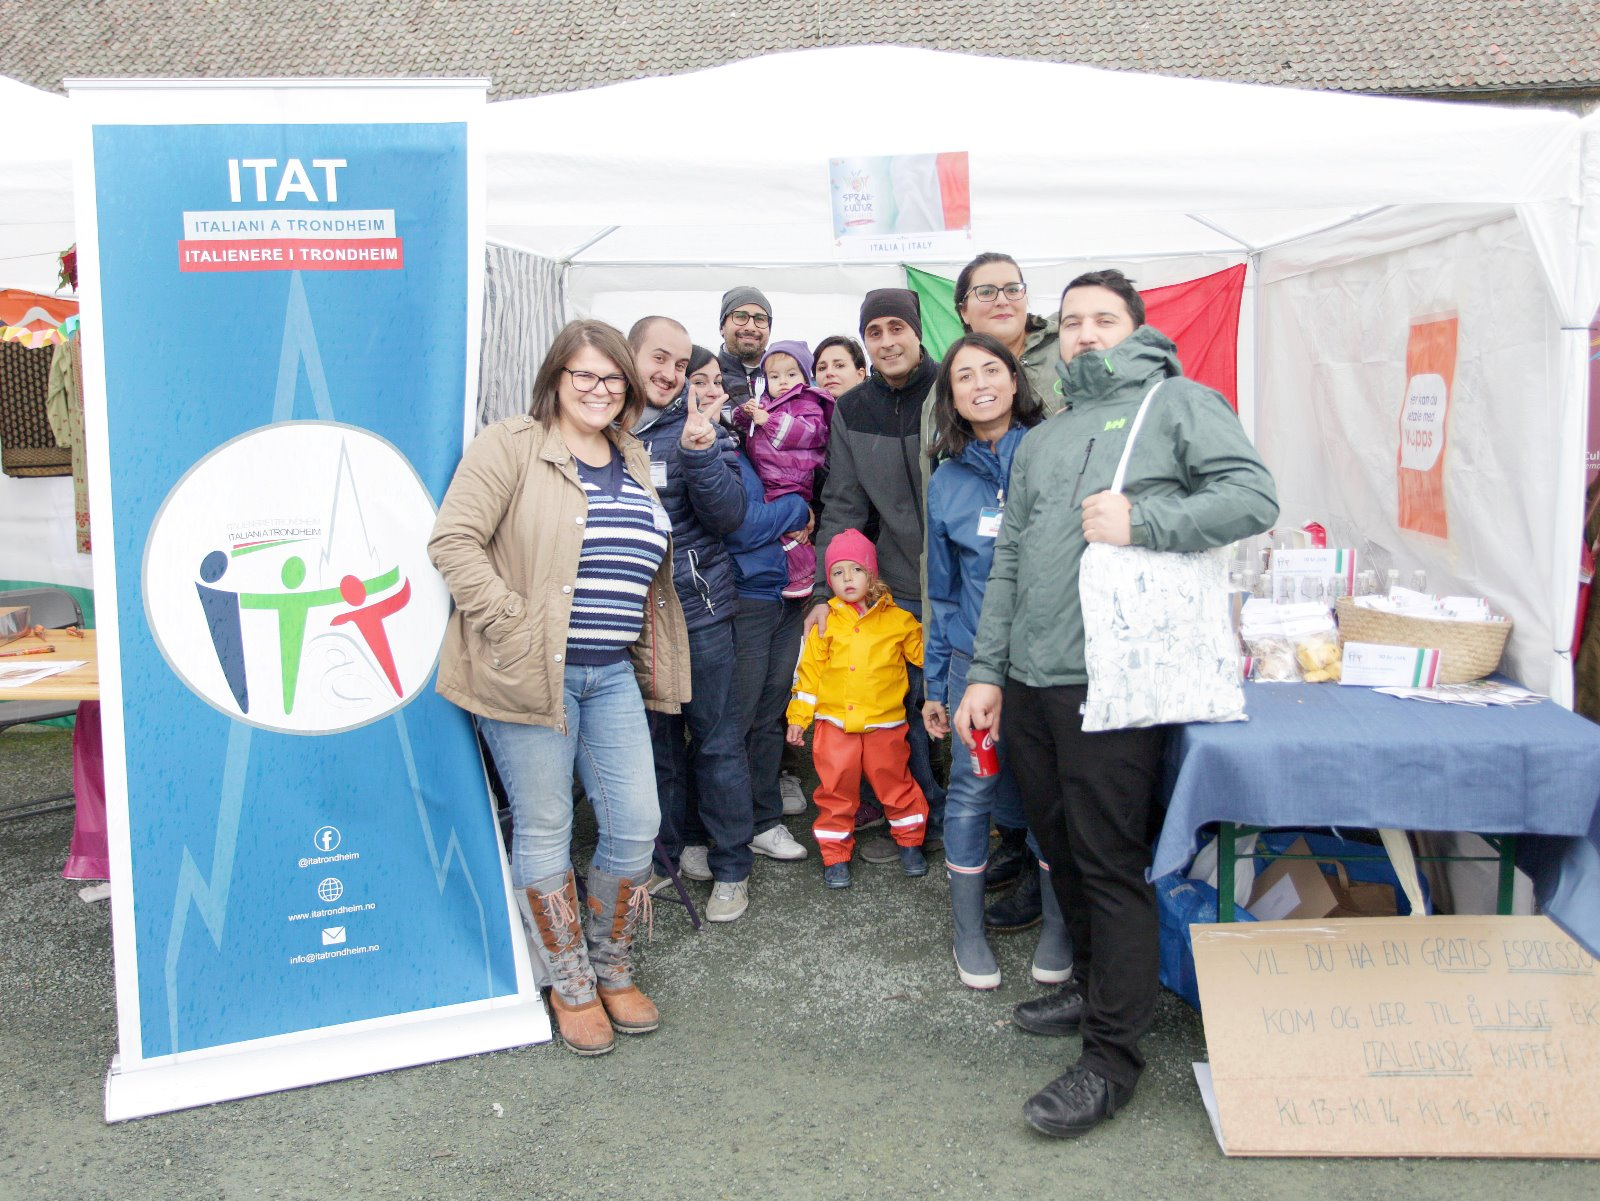 Språk- og kulturfestivalen a Trondheim: anche ItaT c'era!